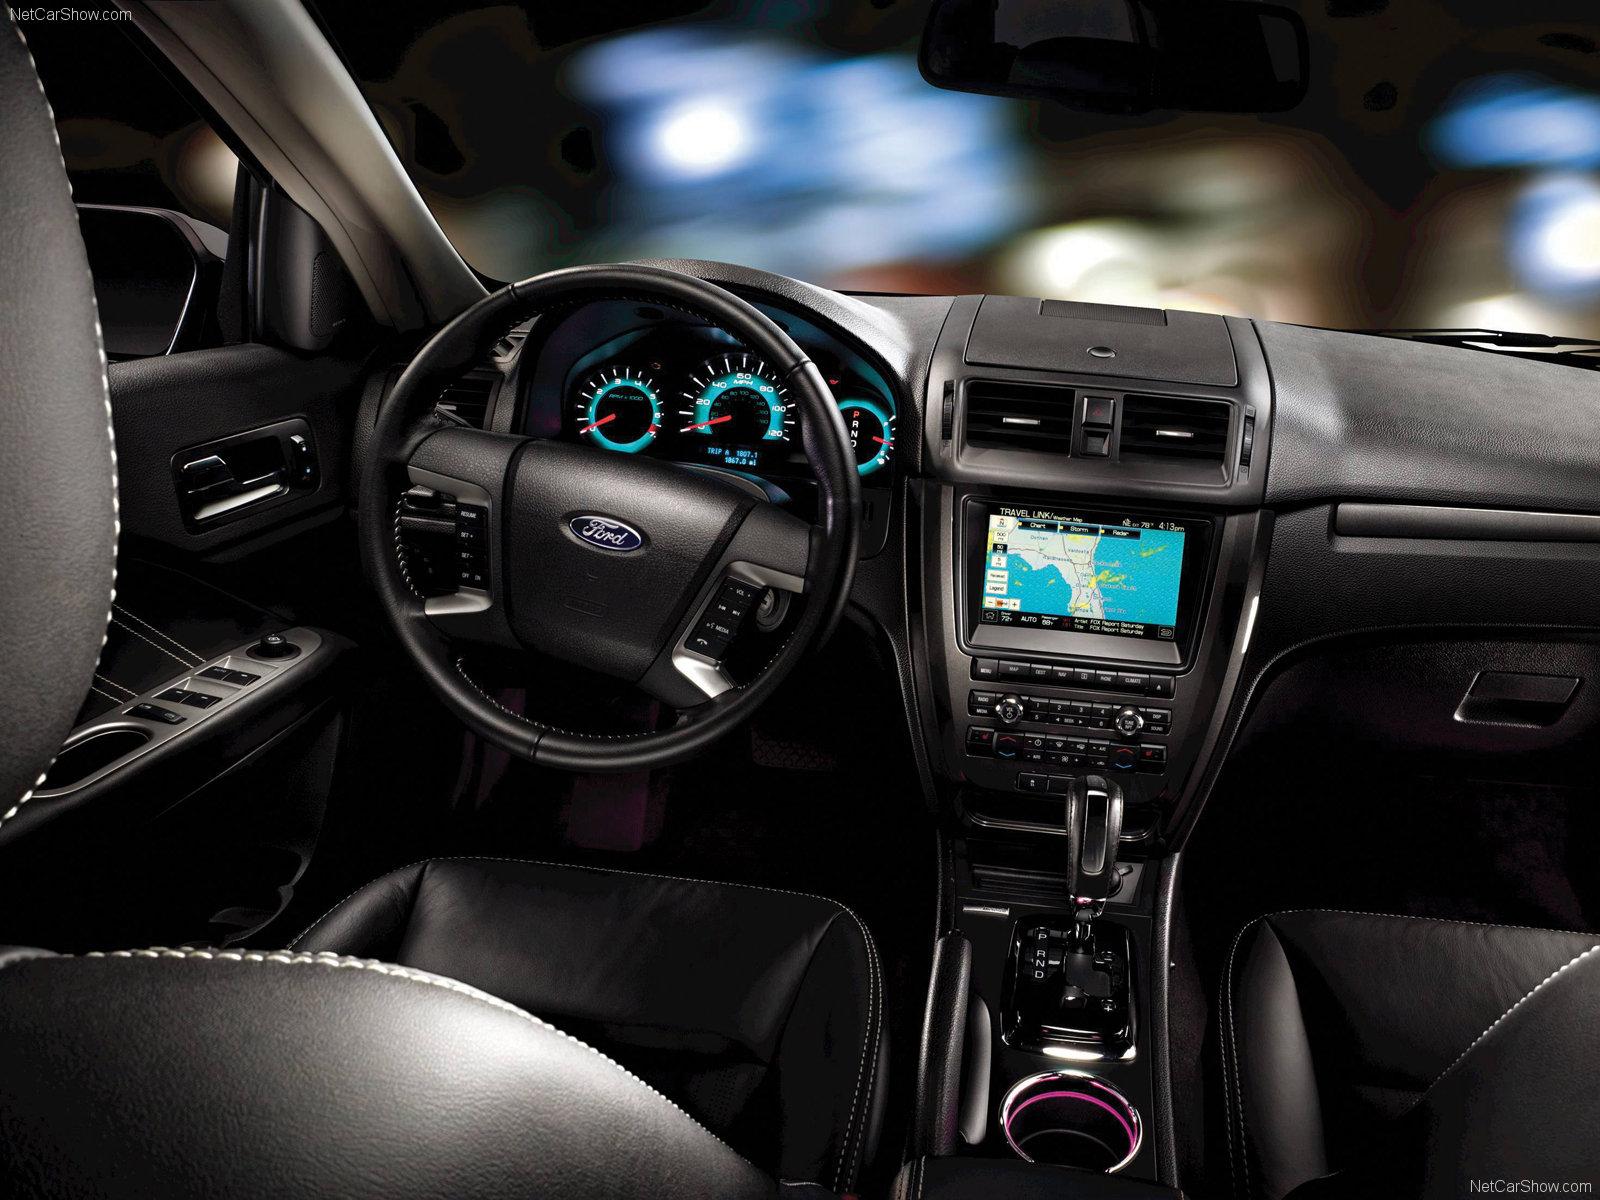 Тюнинг Ford Fusion Sedan 2010 фото тюнинга Форд Фьюжн